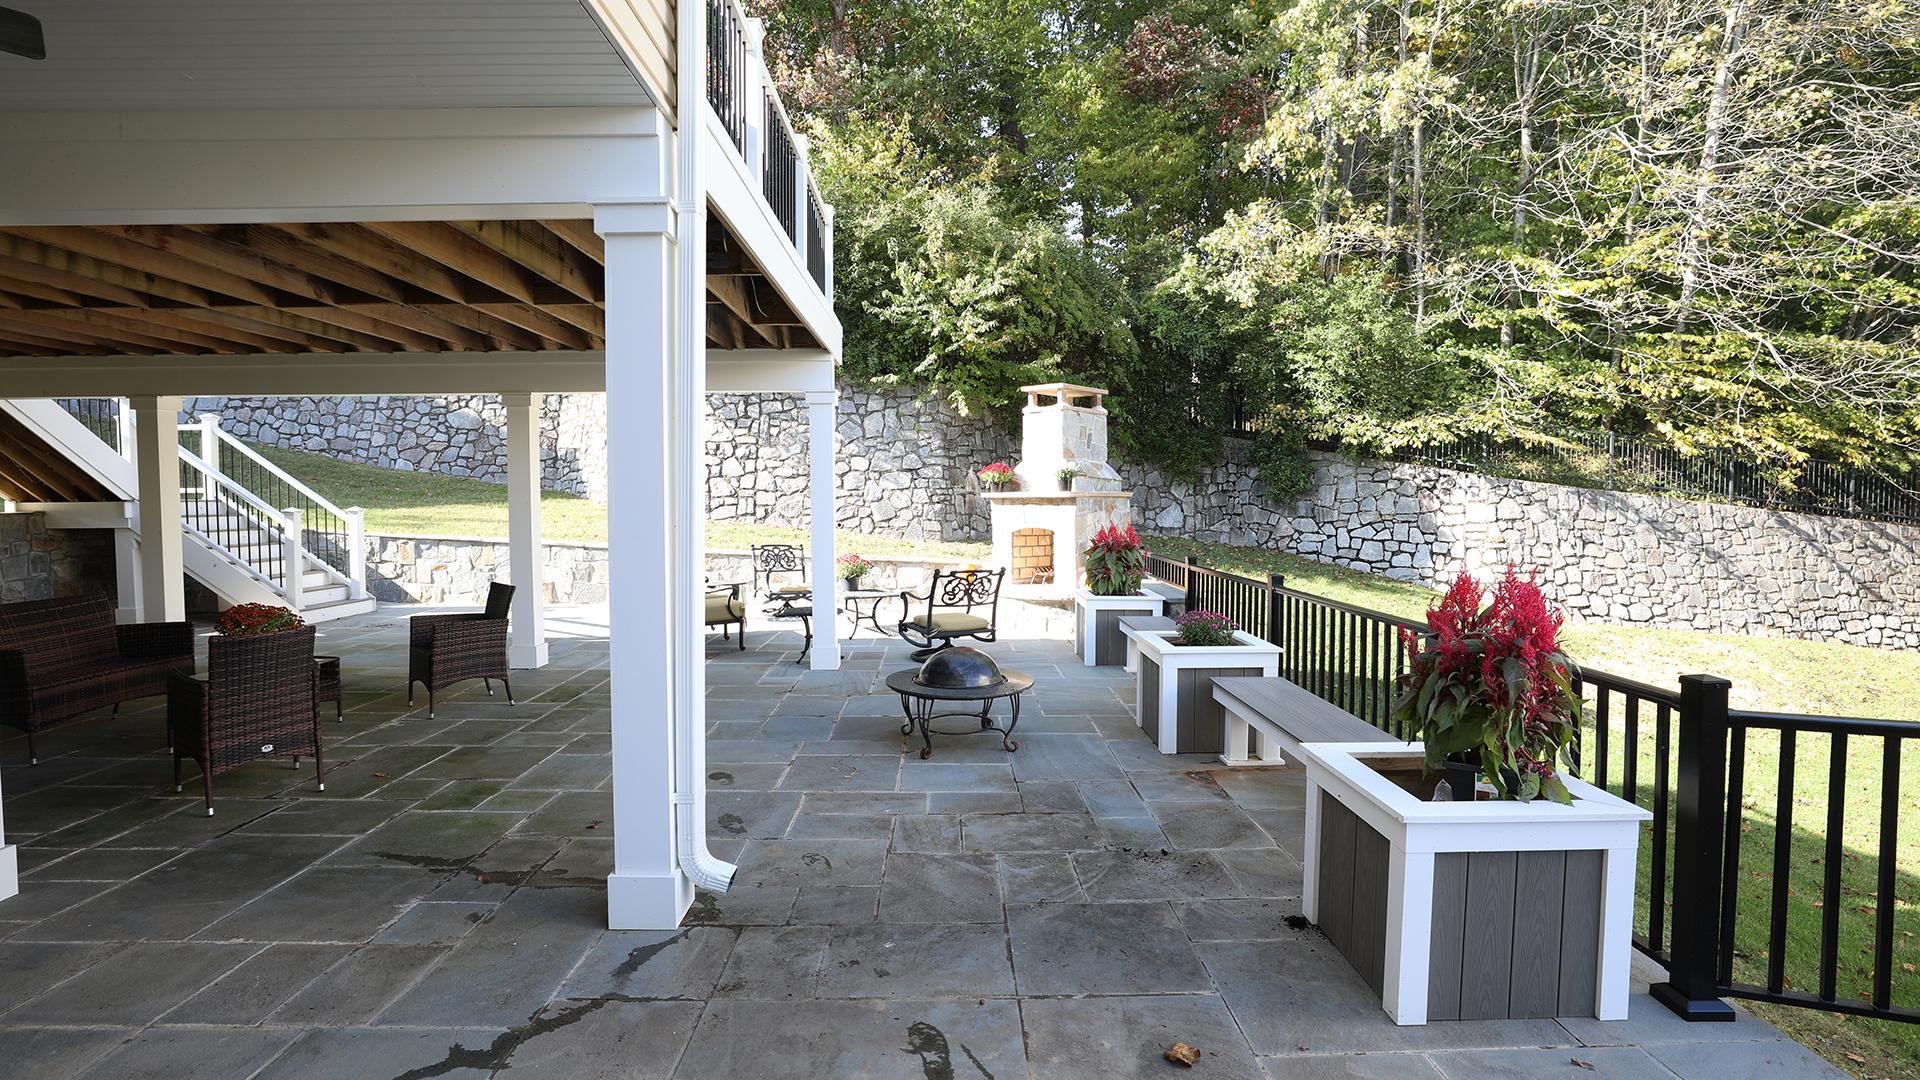 2021 NARI Metro DC Coty MERIT AWARD Residential Landscape Design/ Outdoor Living over $250,000